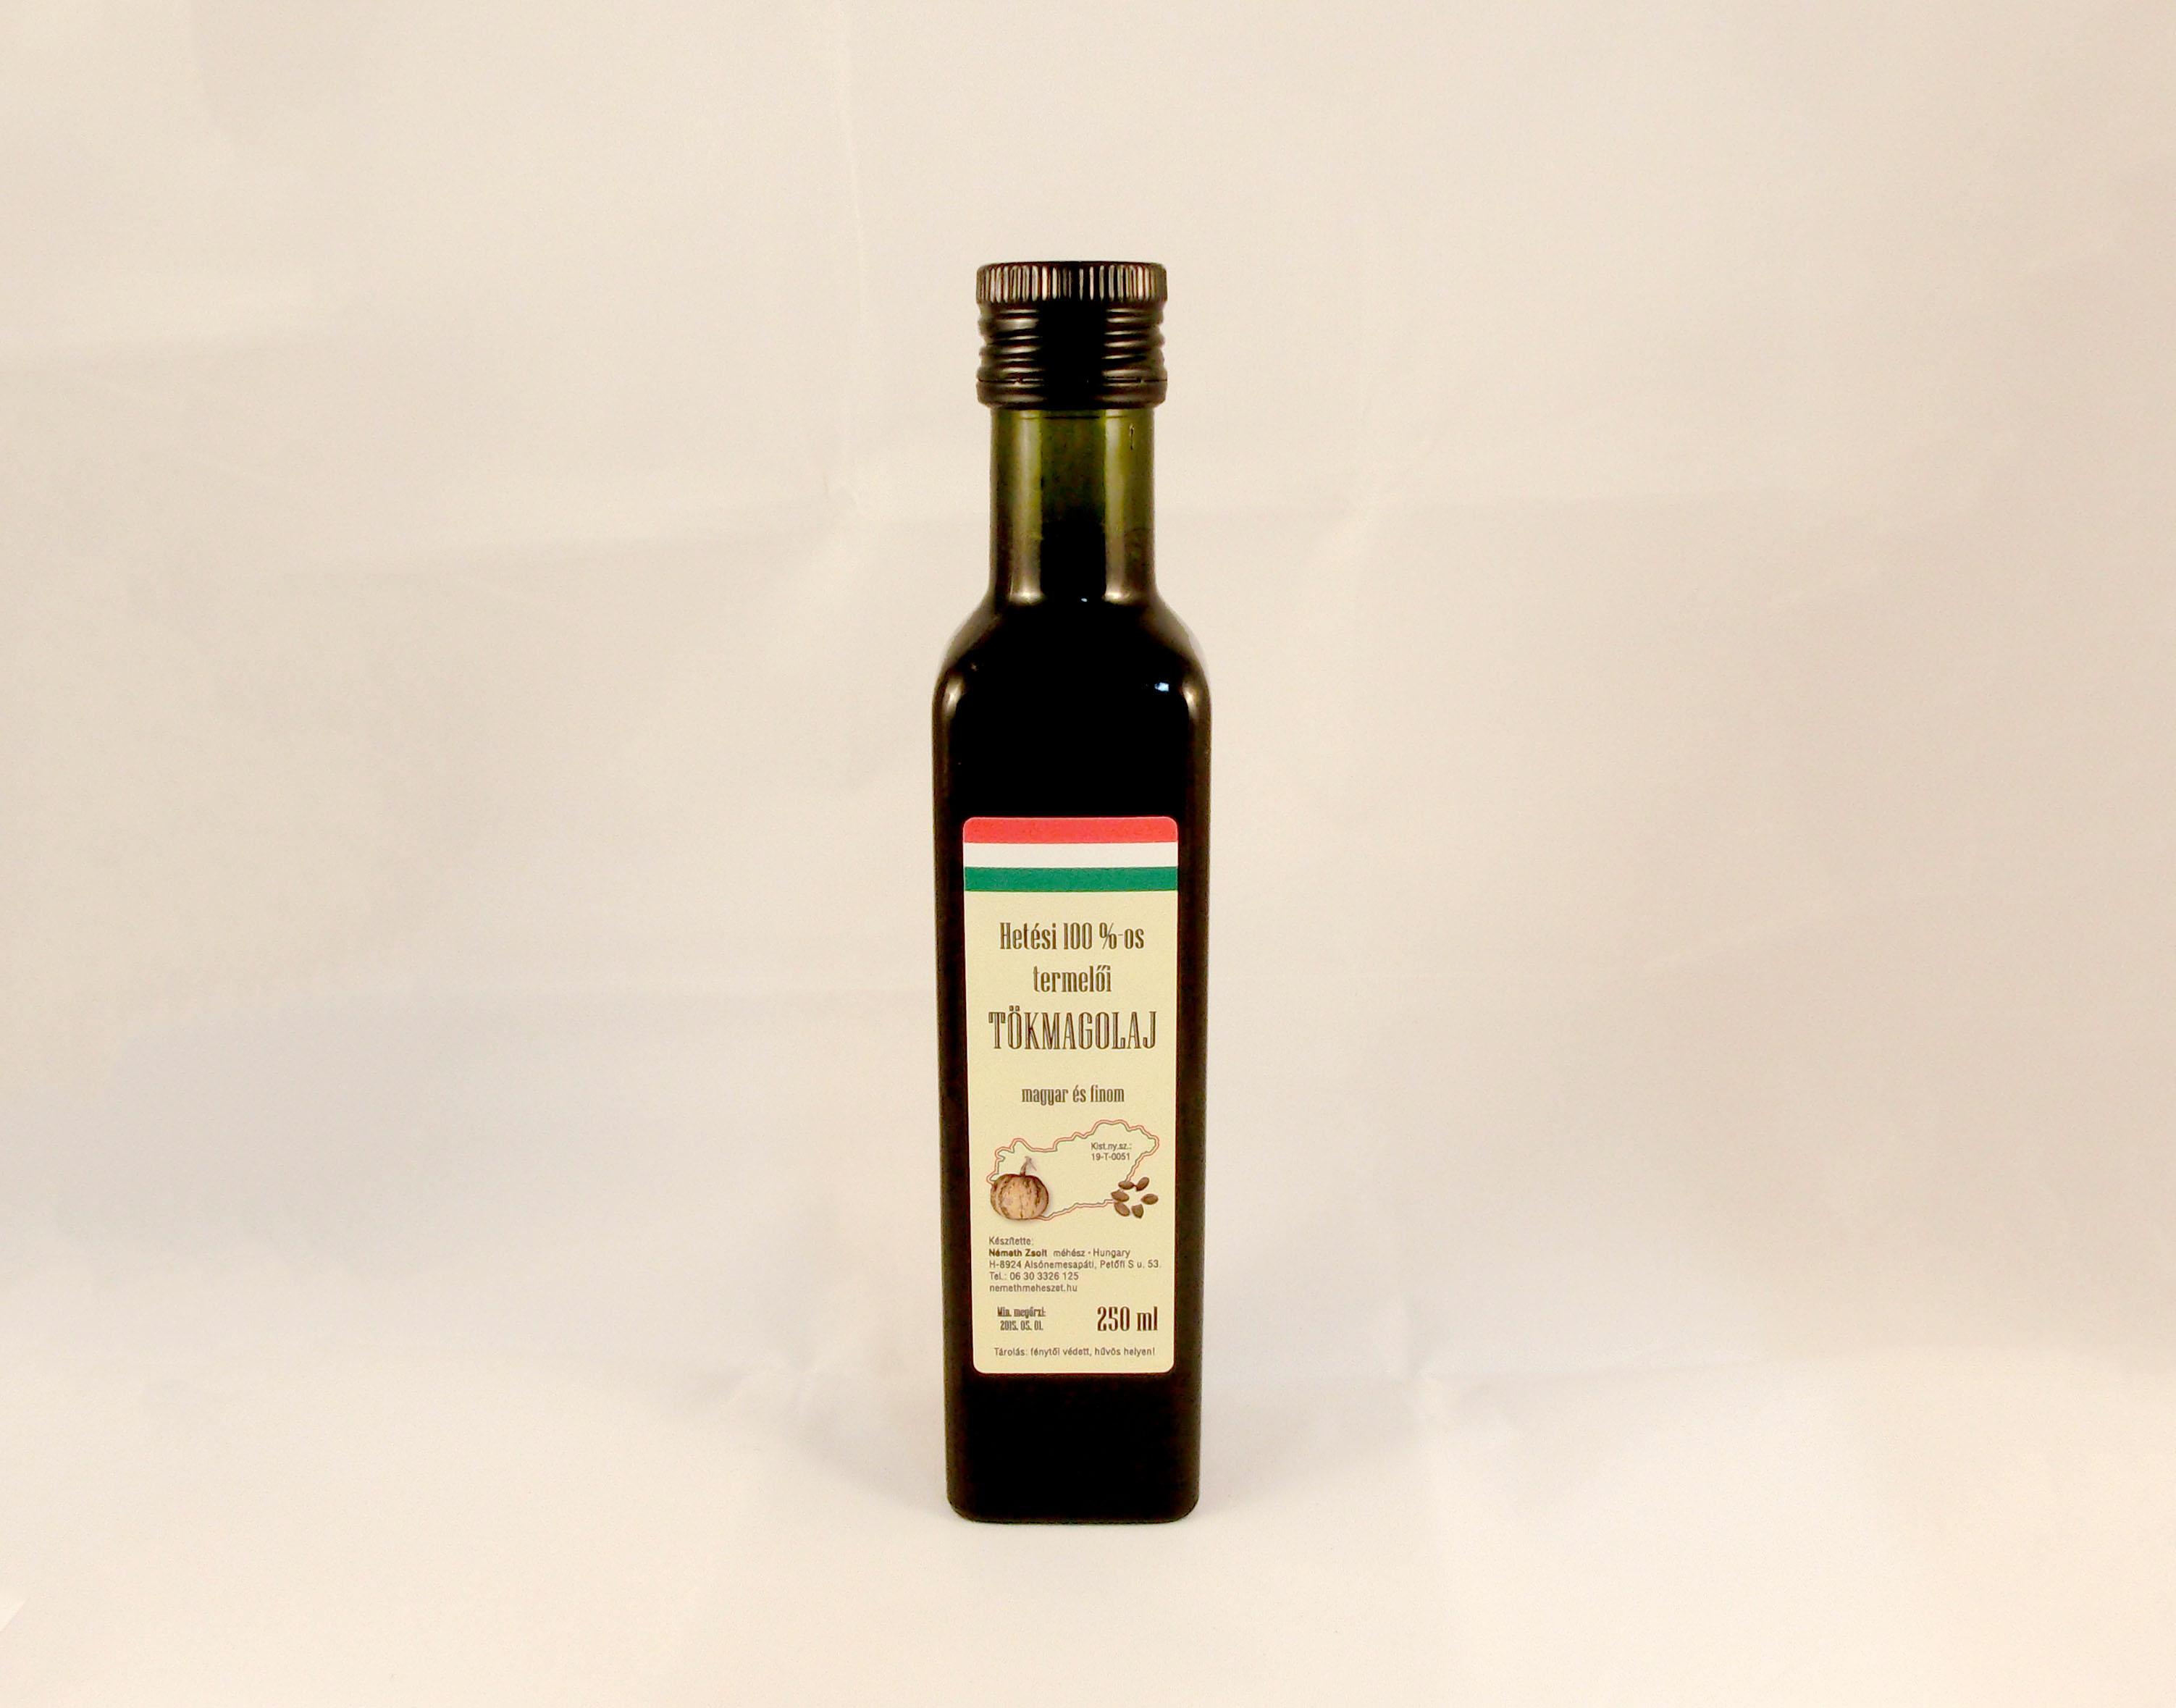 Tökmagolaj 0,25 liter üvegben